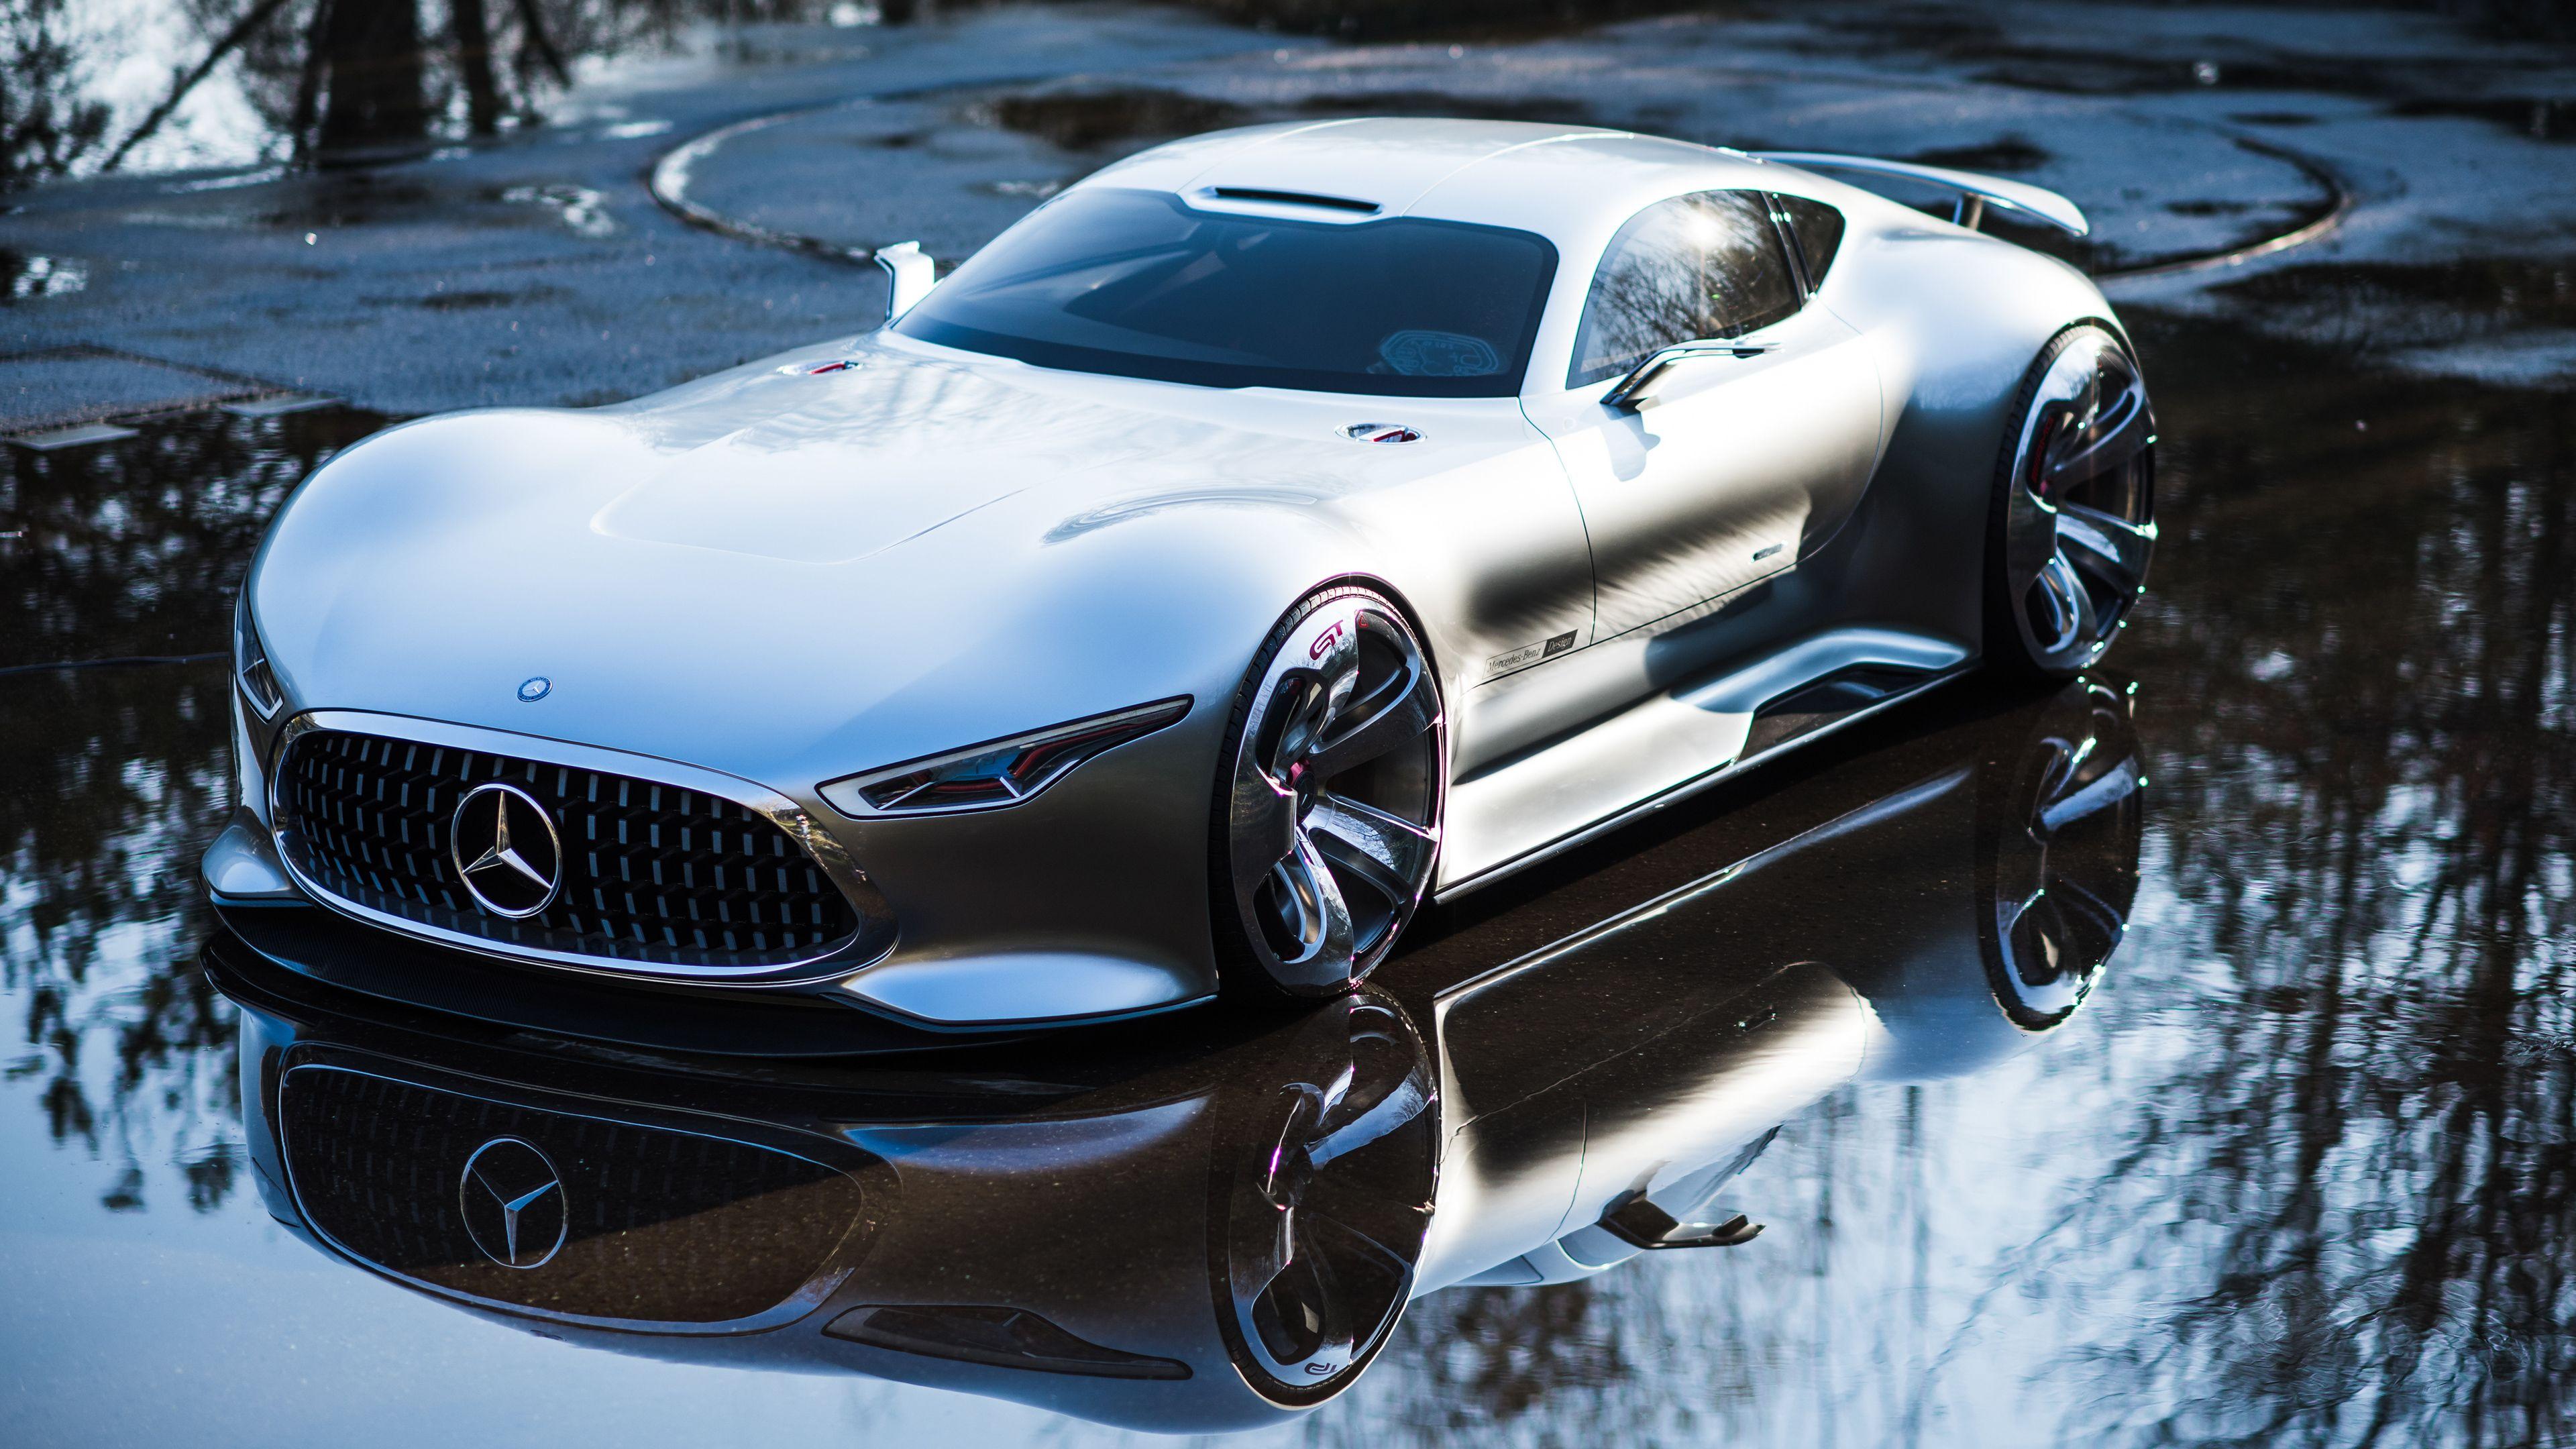 Wallpaper 4k Mercedes Benz Amg Vision Gran Turismo 4k 4k